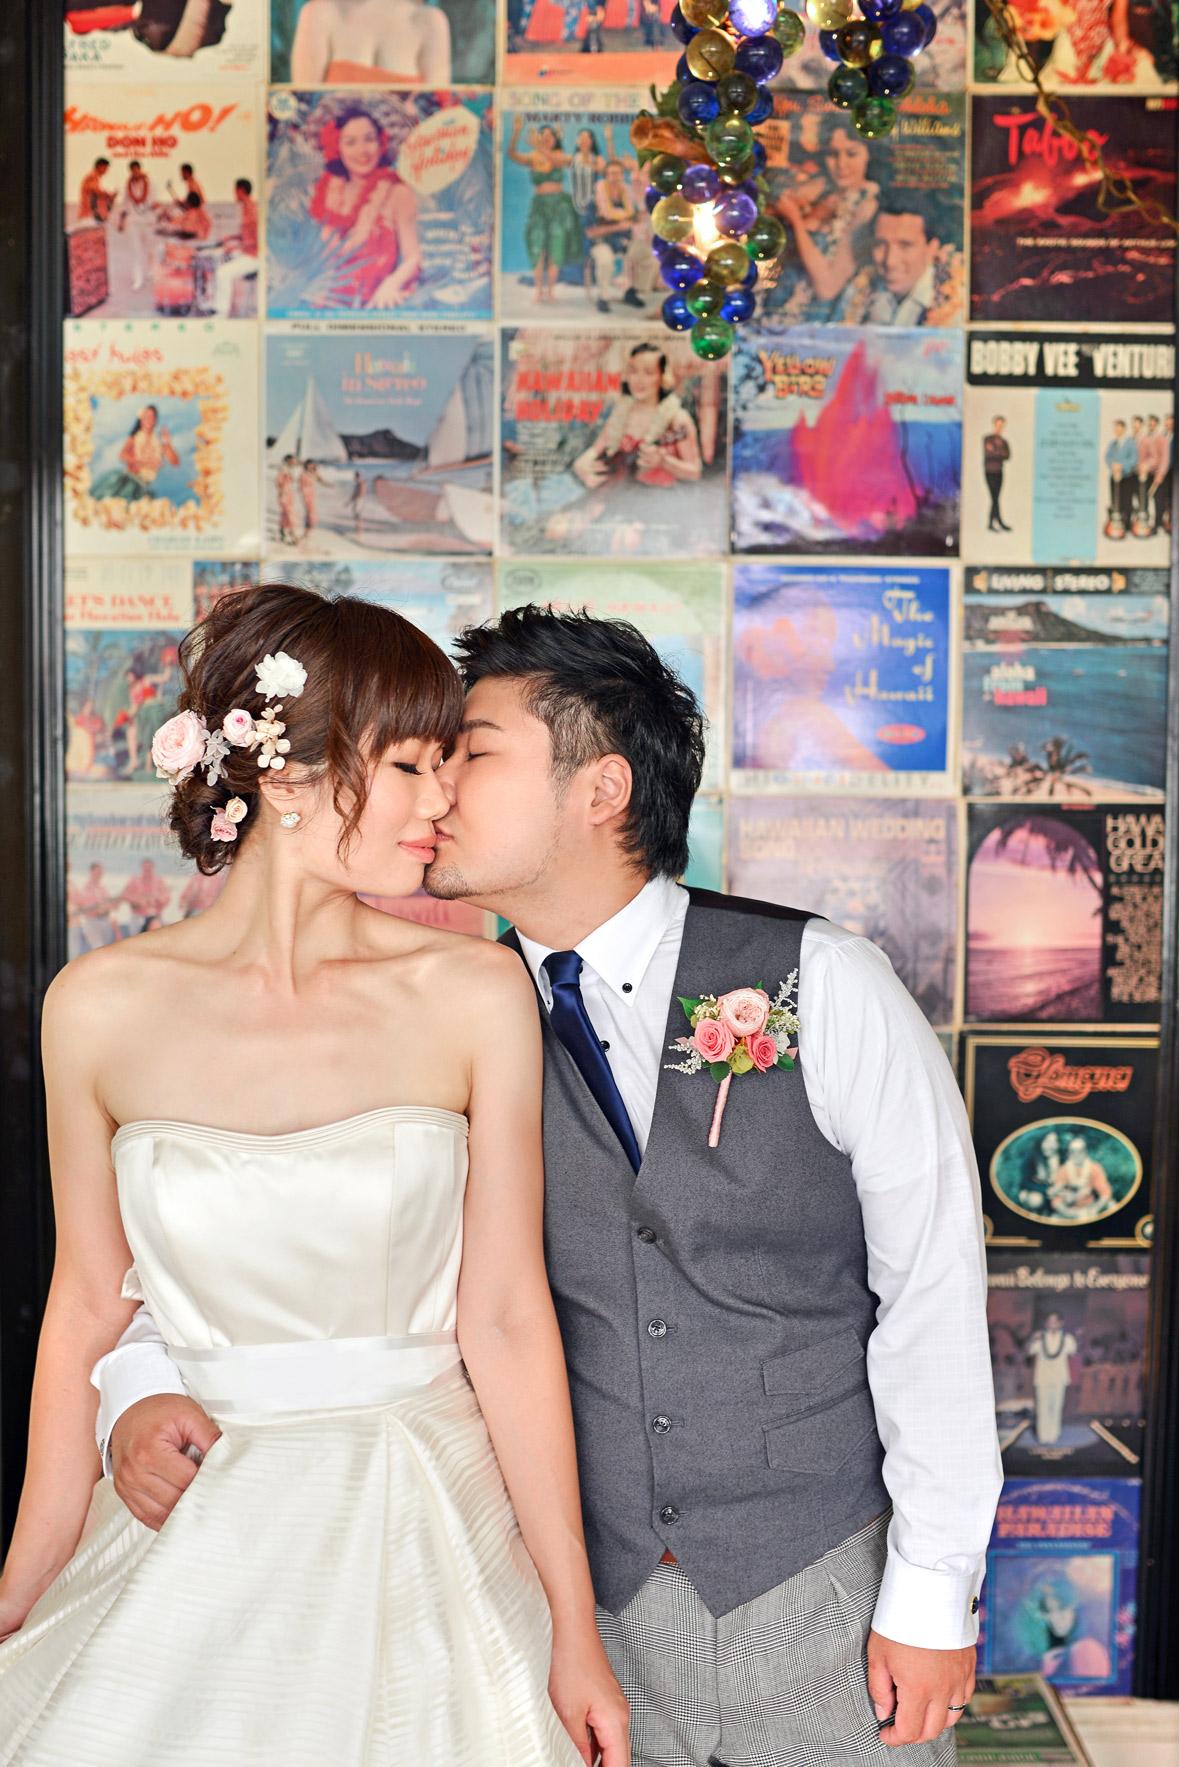 waikiki-beach-wedding-and-downtown-honolulu-hawaii-theater-stephen-ludwig-photography039.jpg